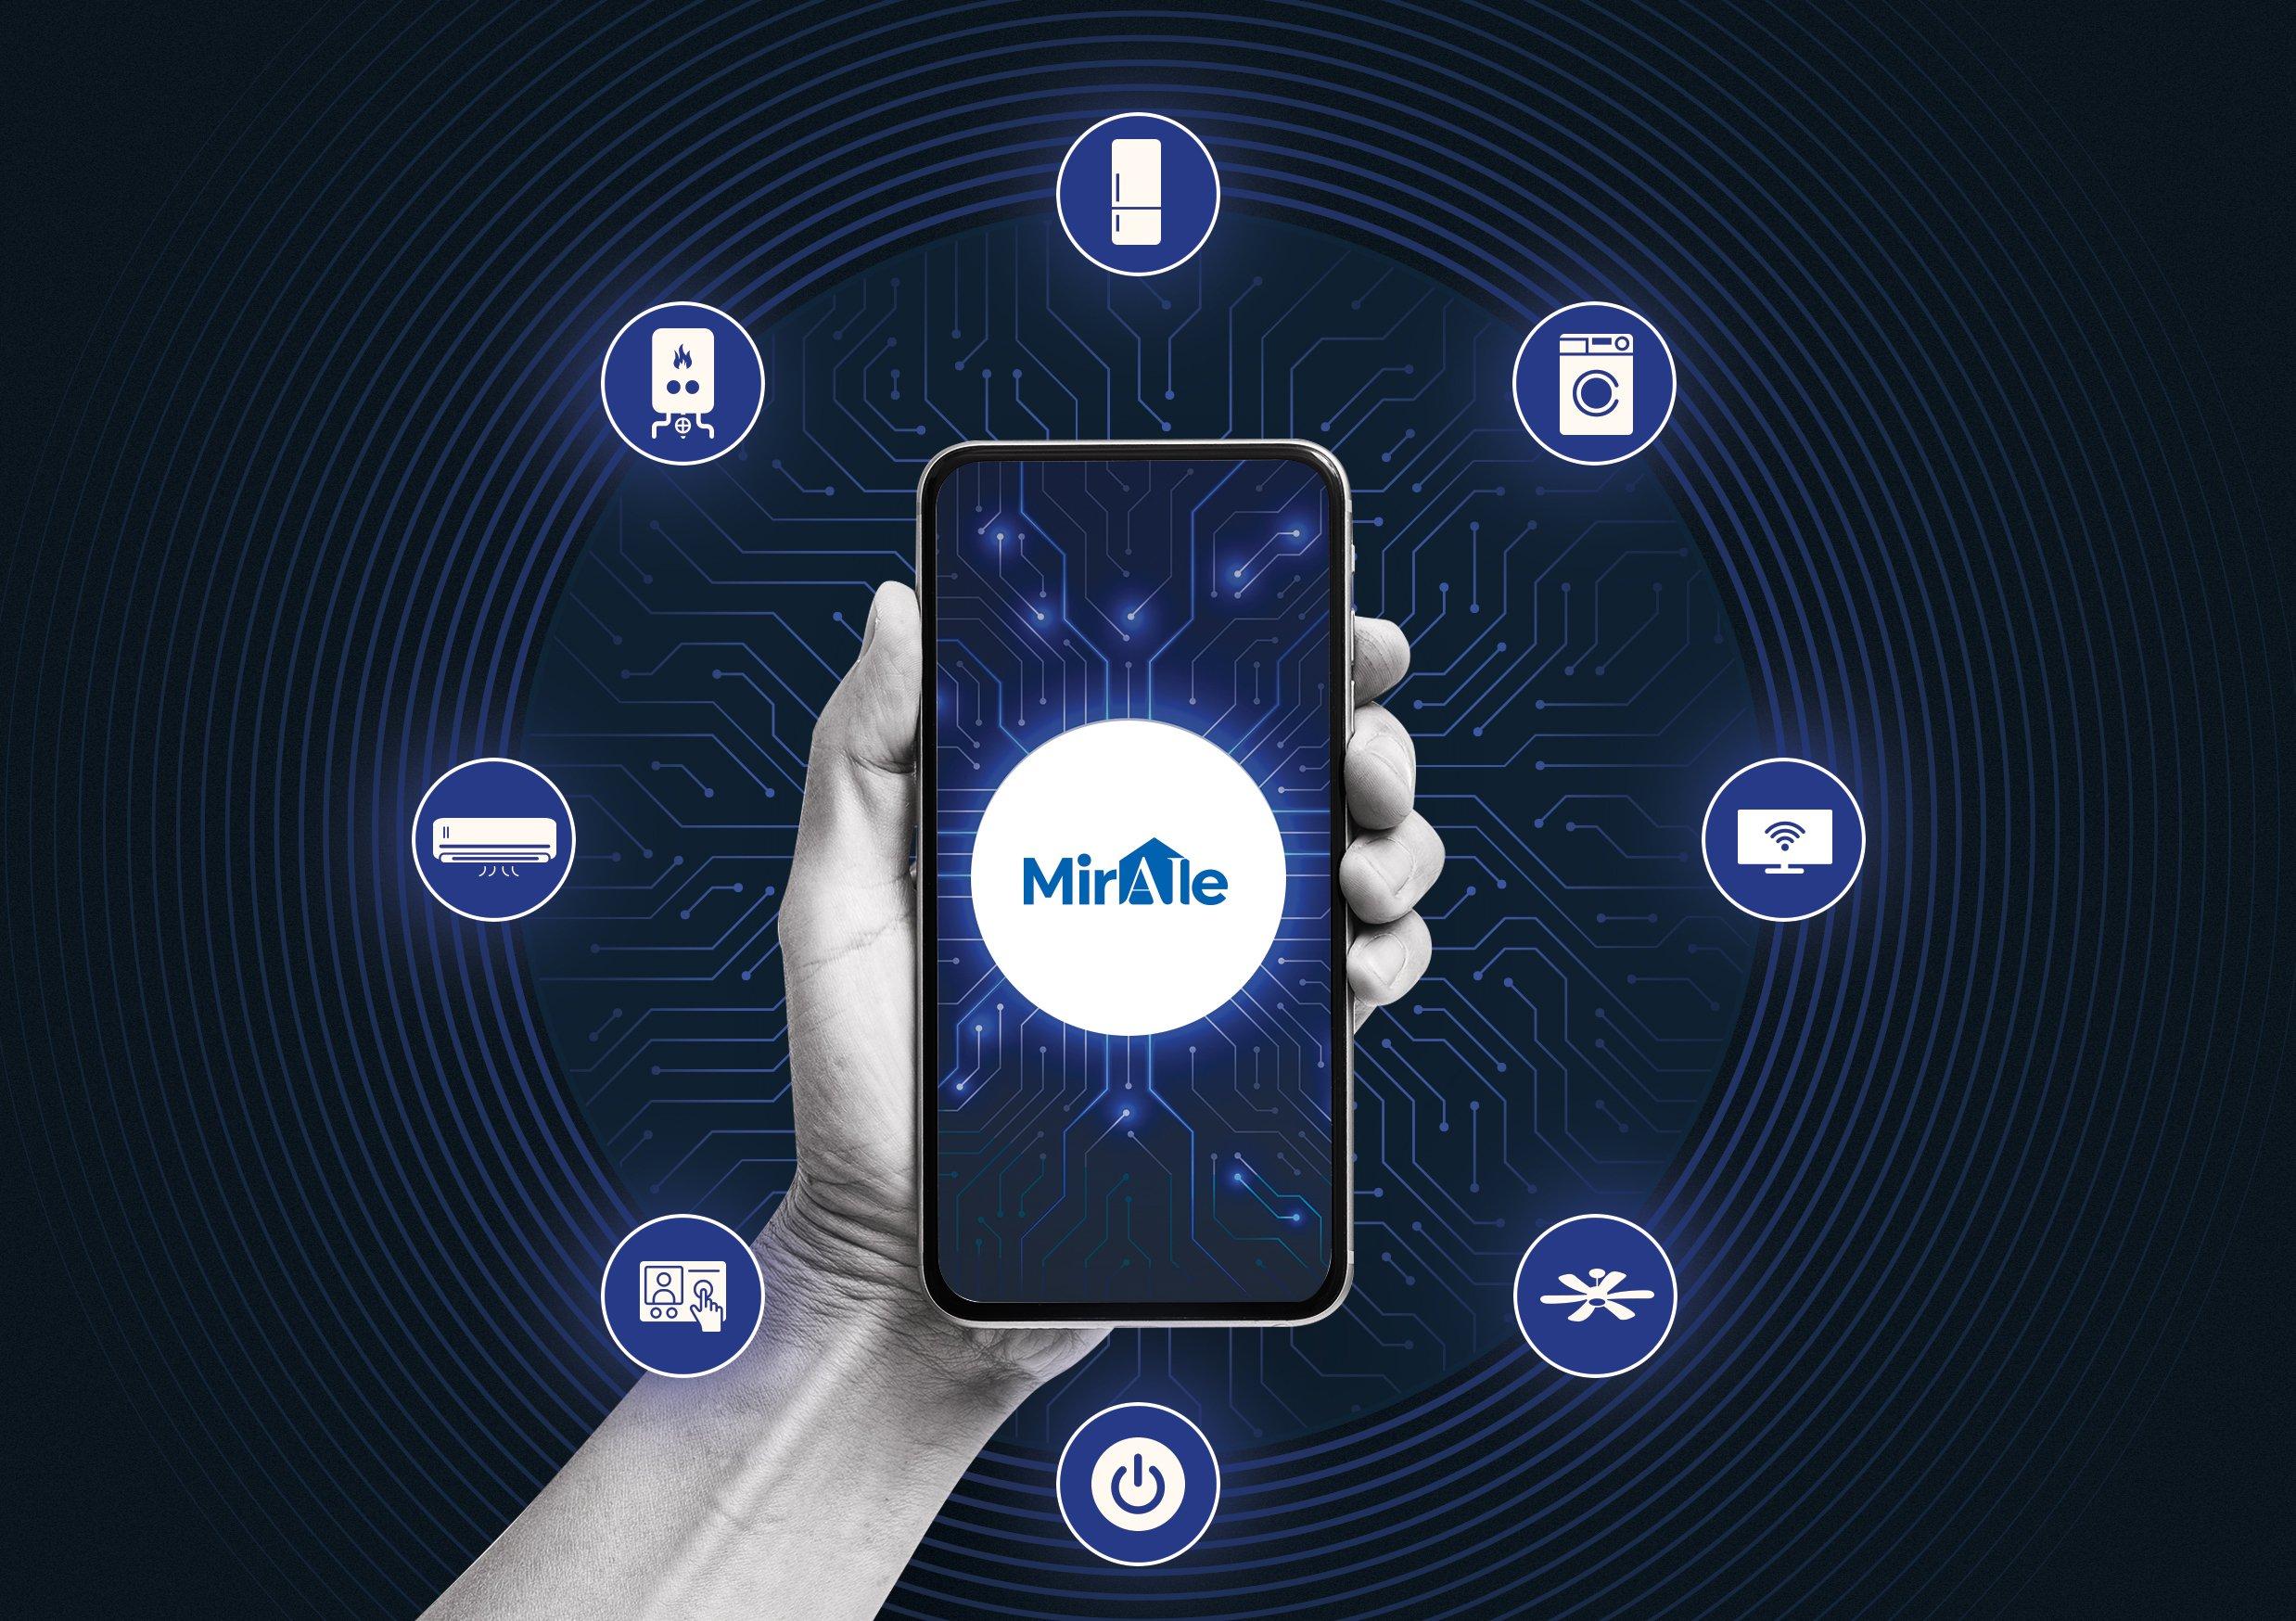 Photo: The Miraie app